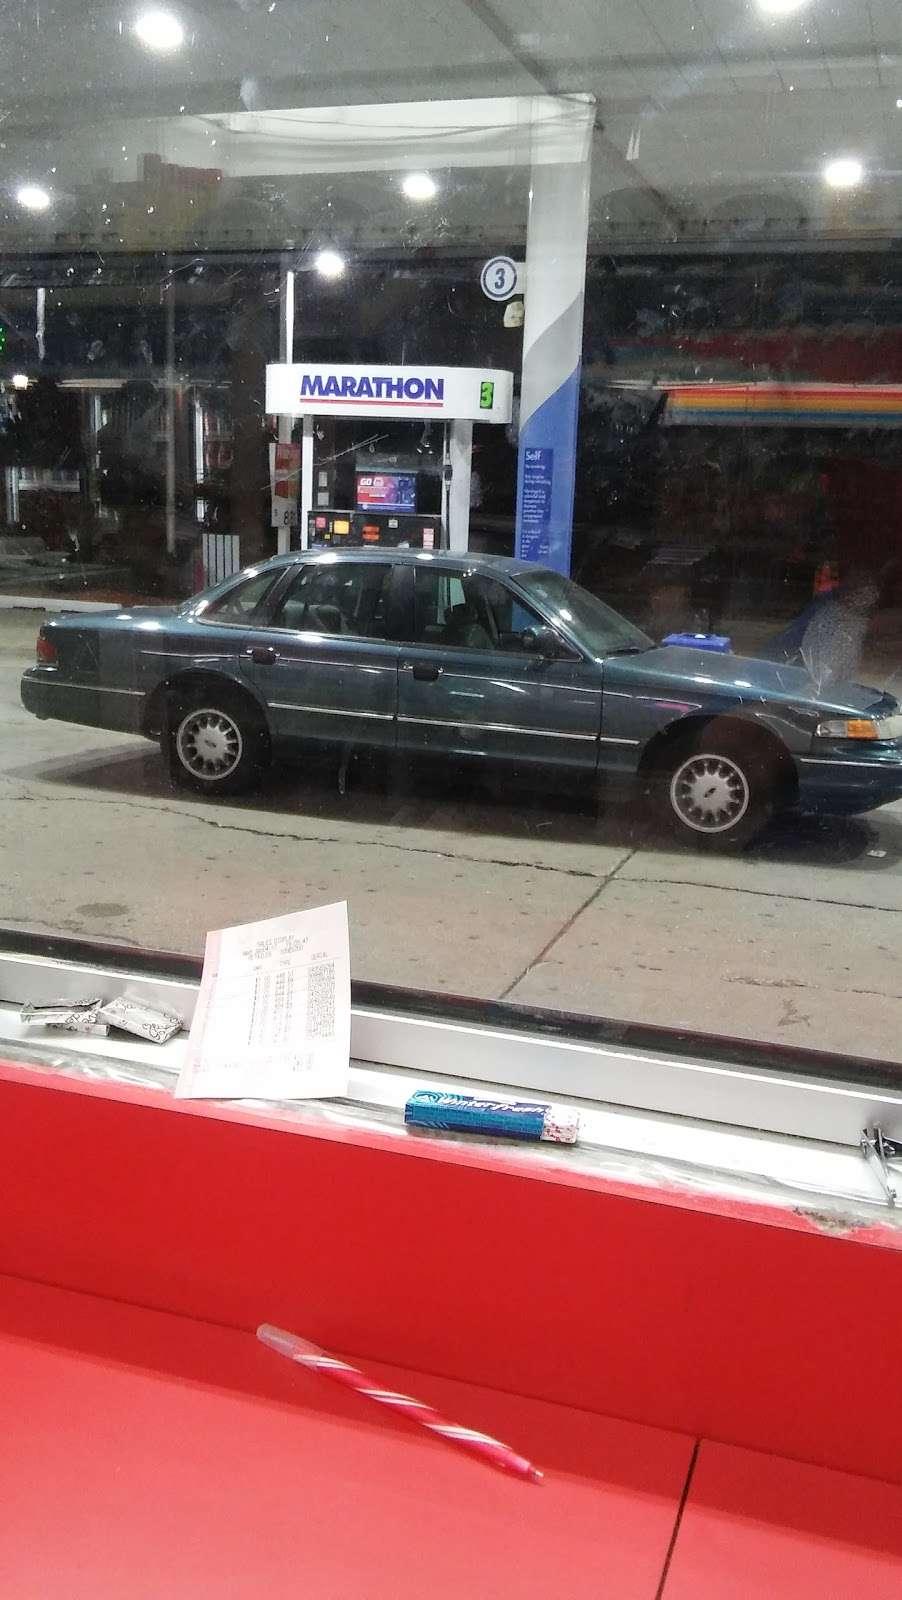 V & V Oil Inc - gas station  | Photo 1 of 1 | Address: 204 Lake St, Maywood, IL 60153, USA | Phone: (708) 410-2270